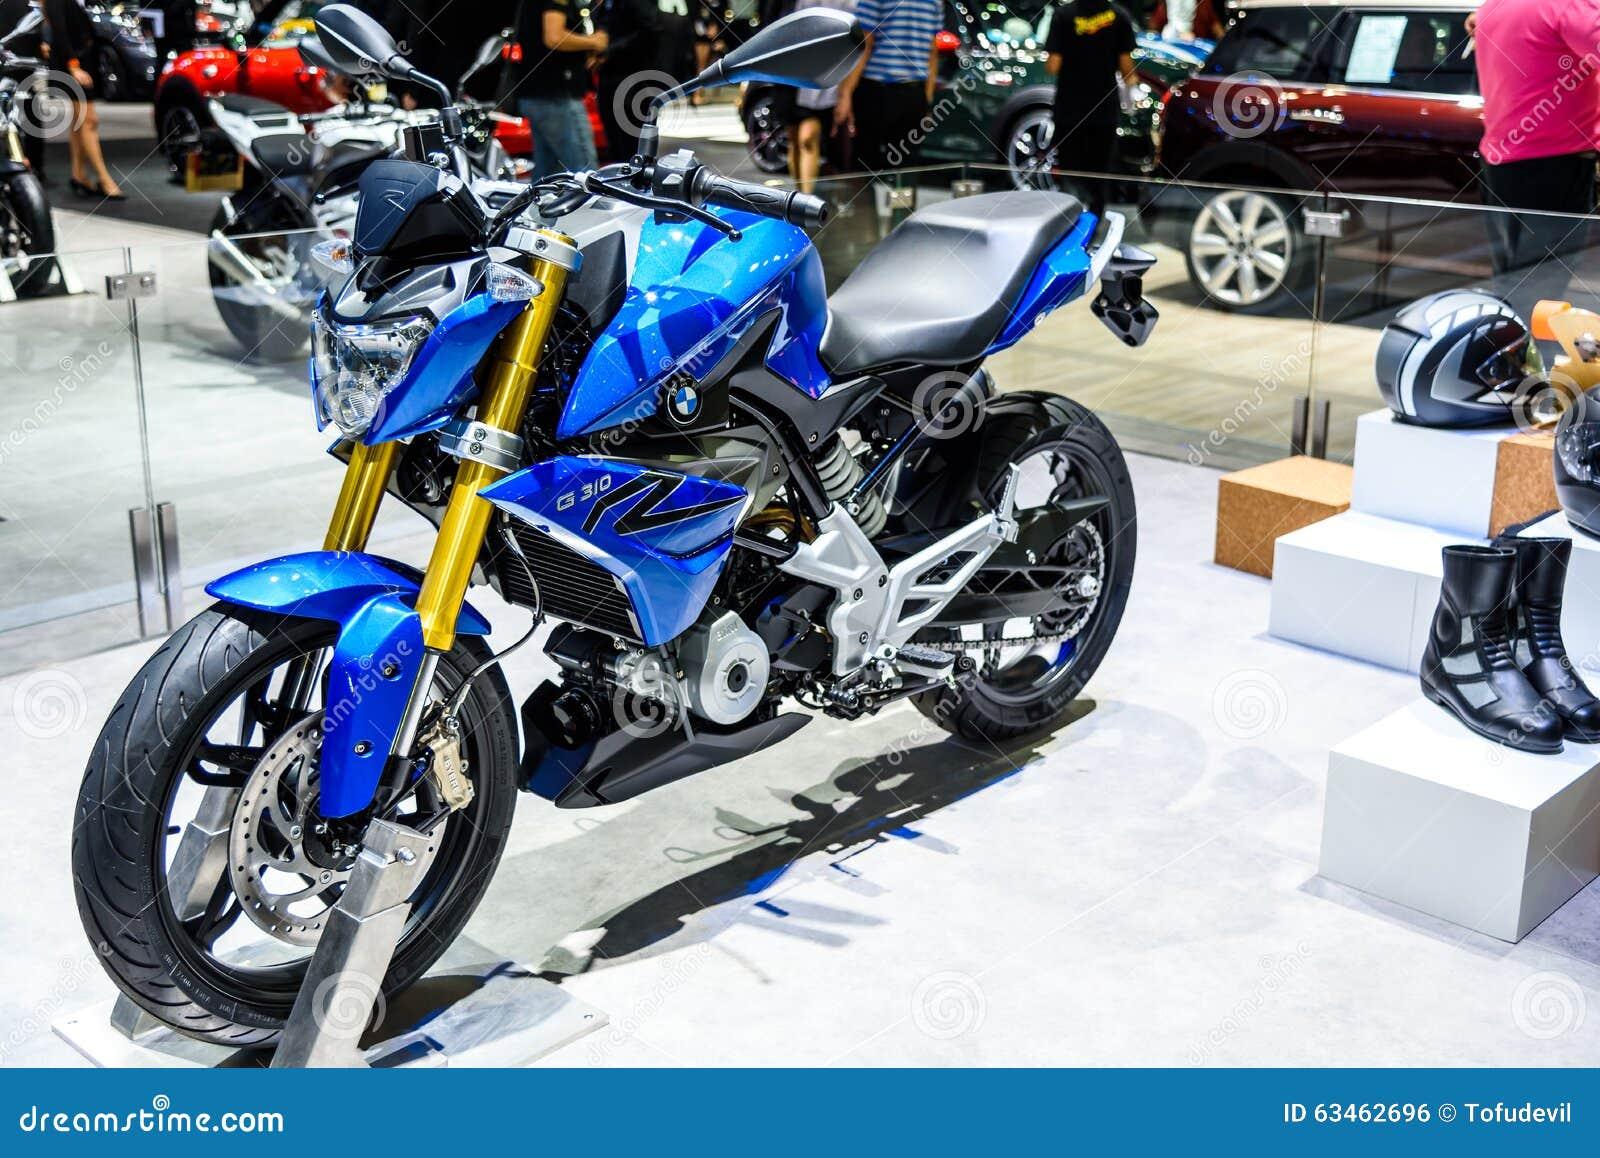 motos g de bmw 310 r photo ditorial image du motocyclette 63462696. Black Bedroom Furniture Sets. Home Design Ideas